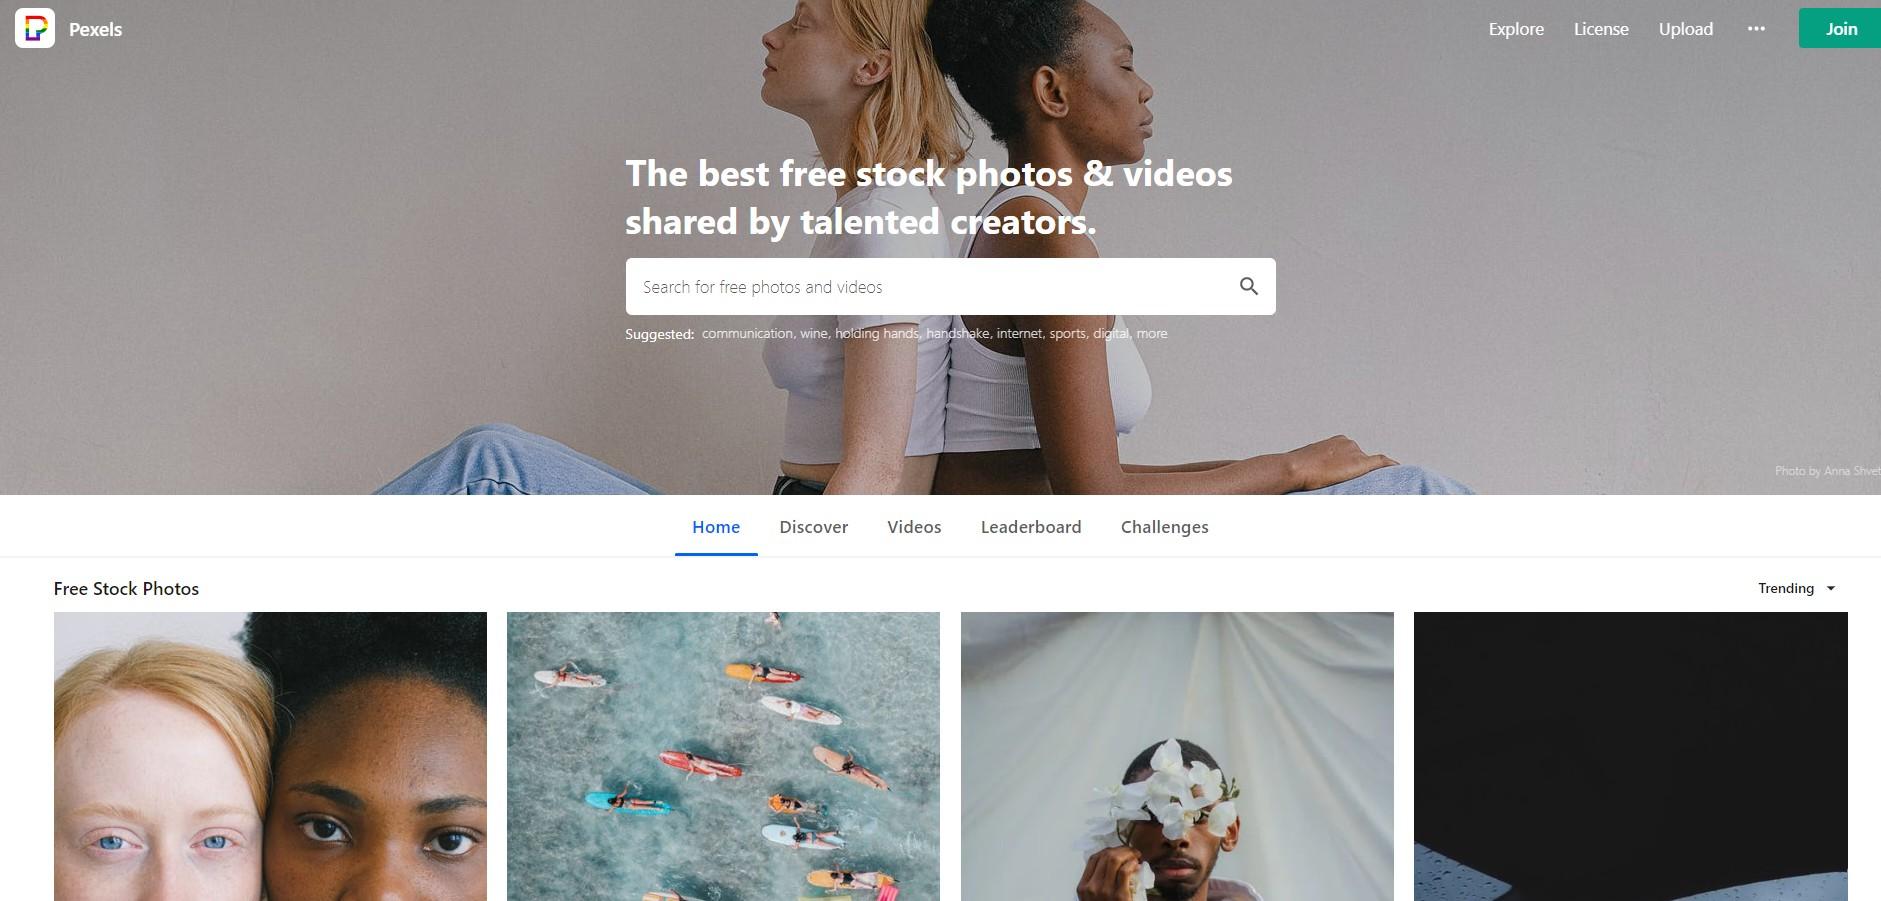 free stock videos - Pexels